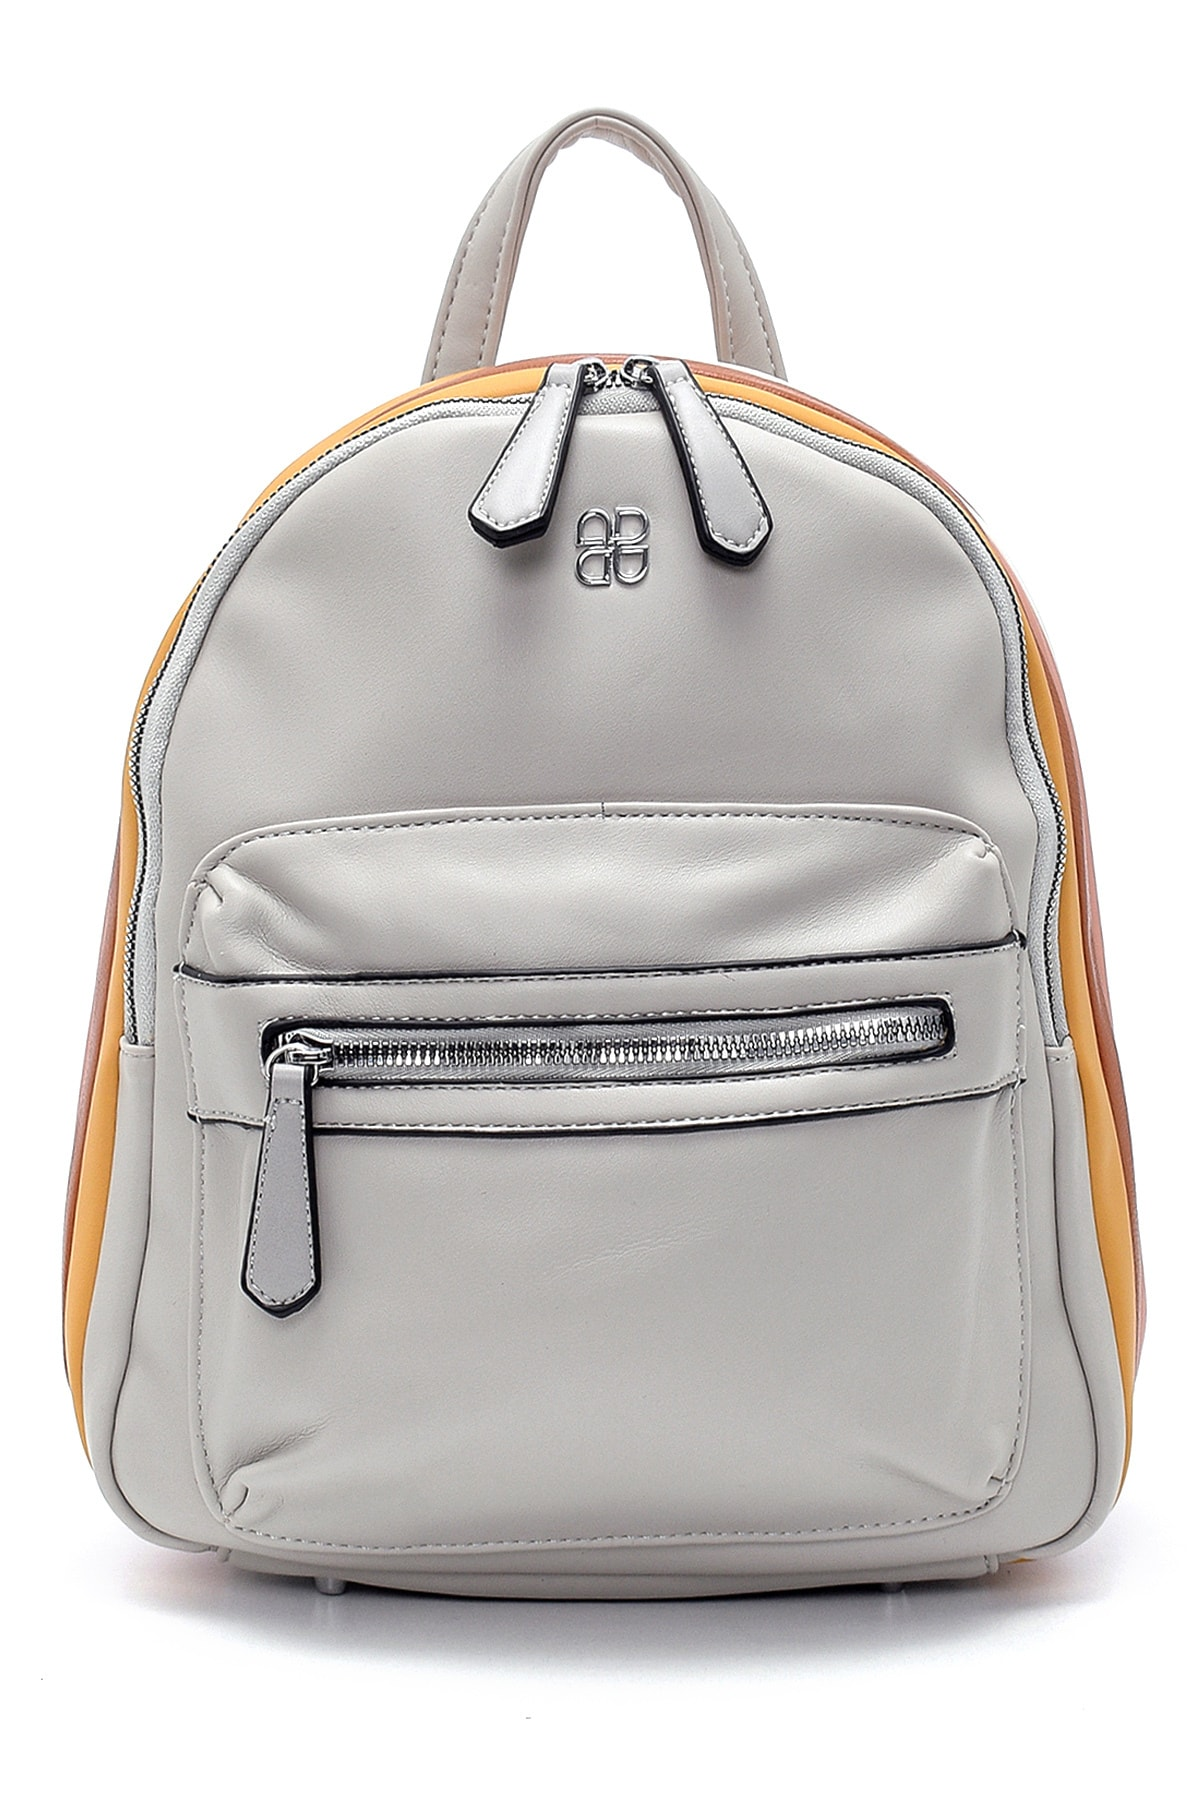 2021 Women S handbag Color Detailed Backpack, new Mini backpack Crossbody bag for young girls, ladies shoulder Crossbody,